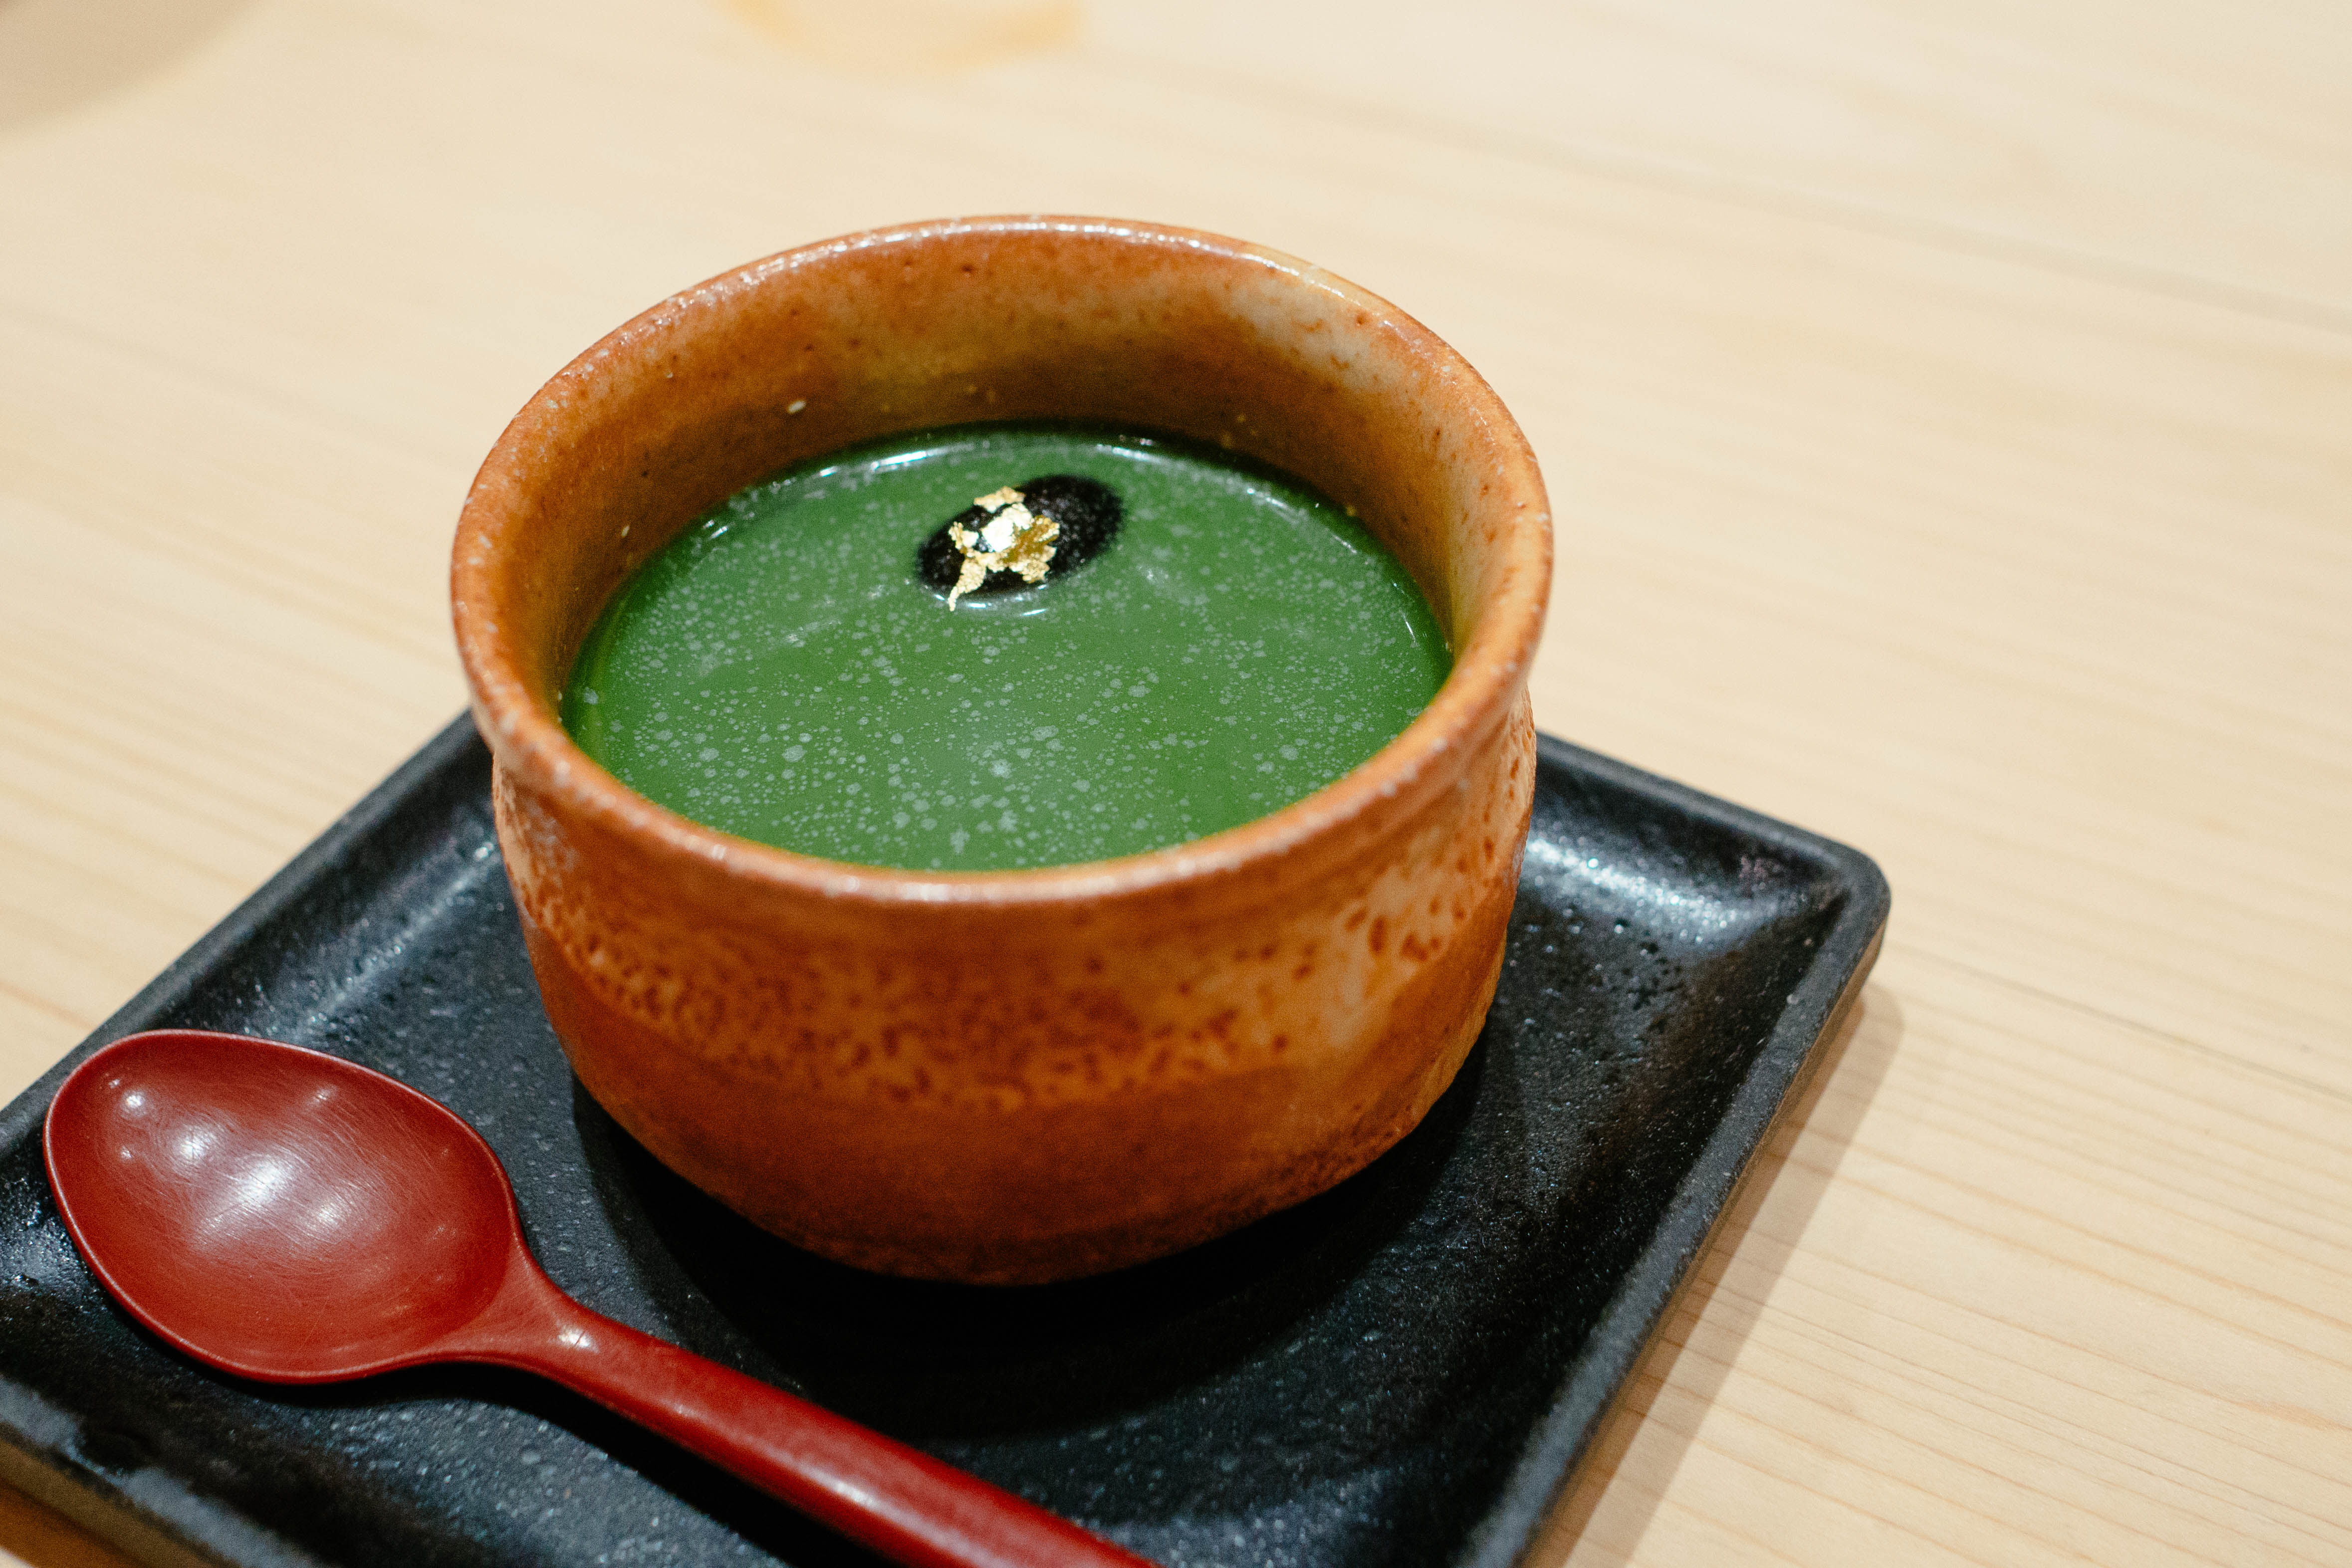 sushi-sase-hong-kong-best-sushi-restaurant-hong-kong-21